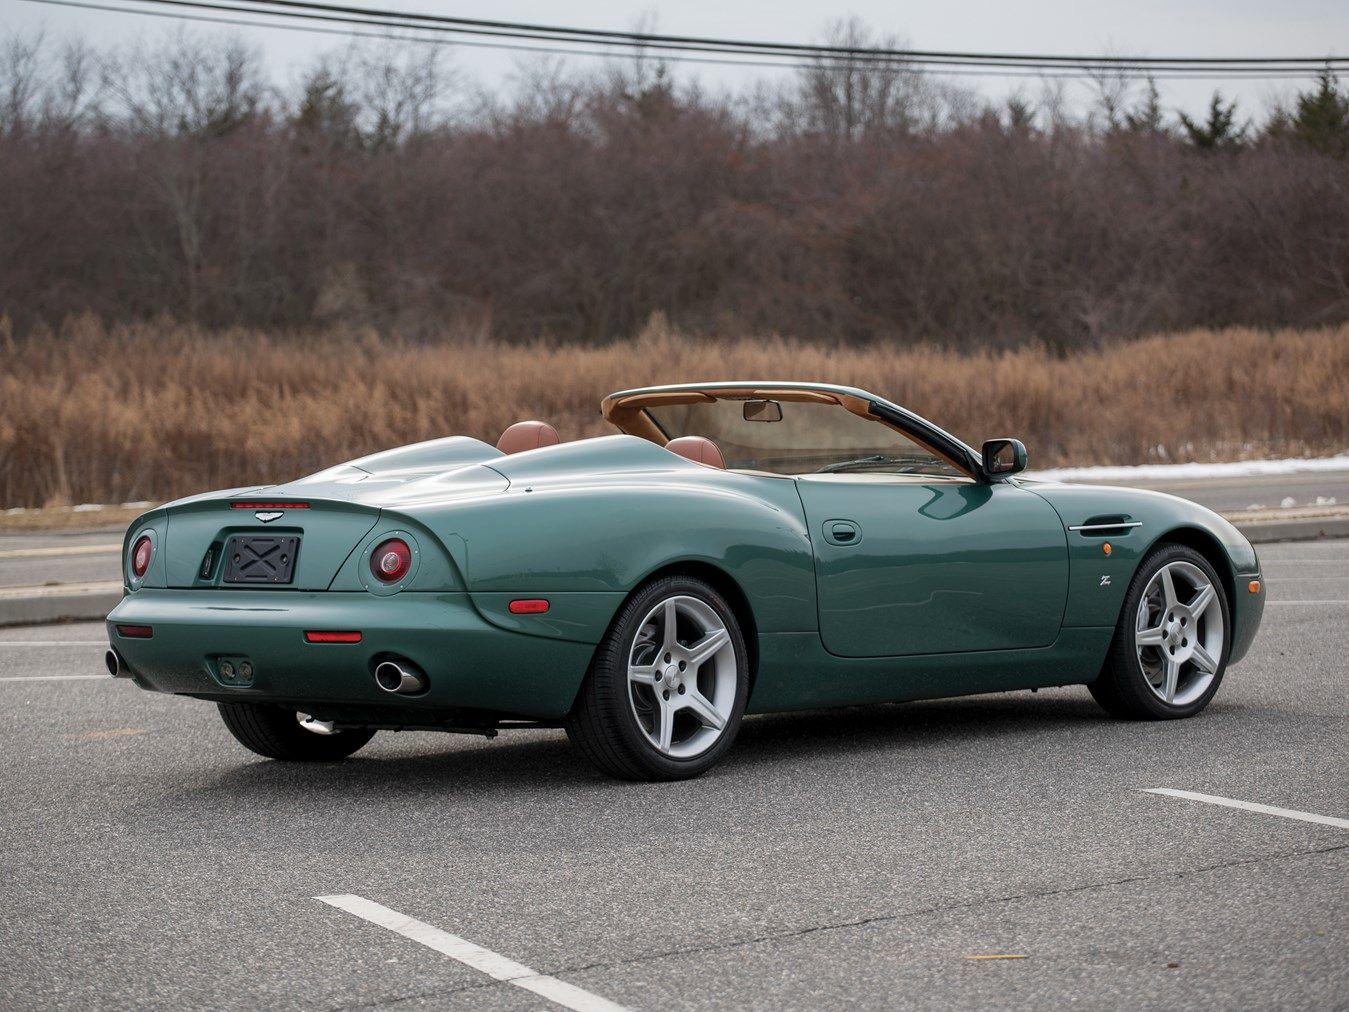 2003 Aston Martin Db Ar1 Zagato Aston Martin Aston Martin For Sale Aston Martin Cars